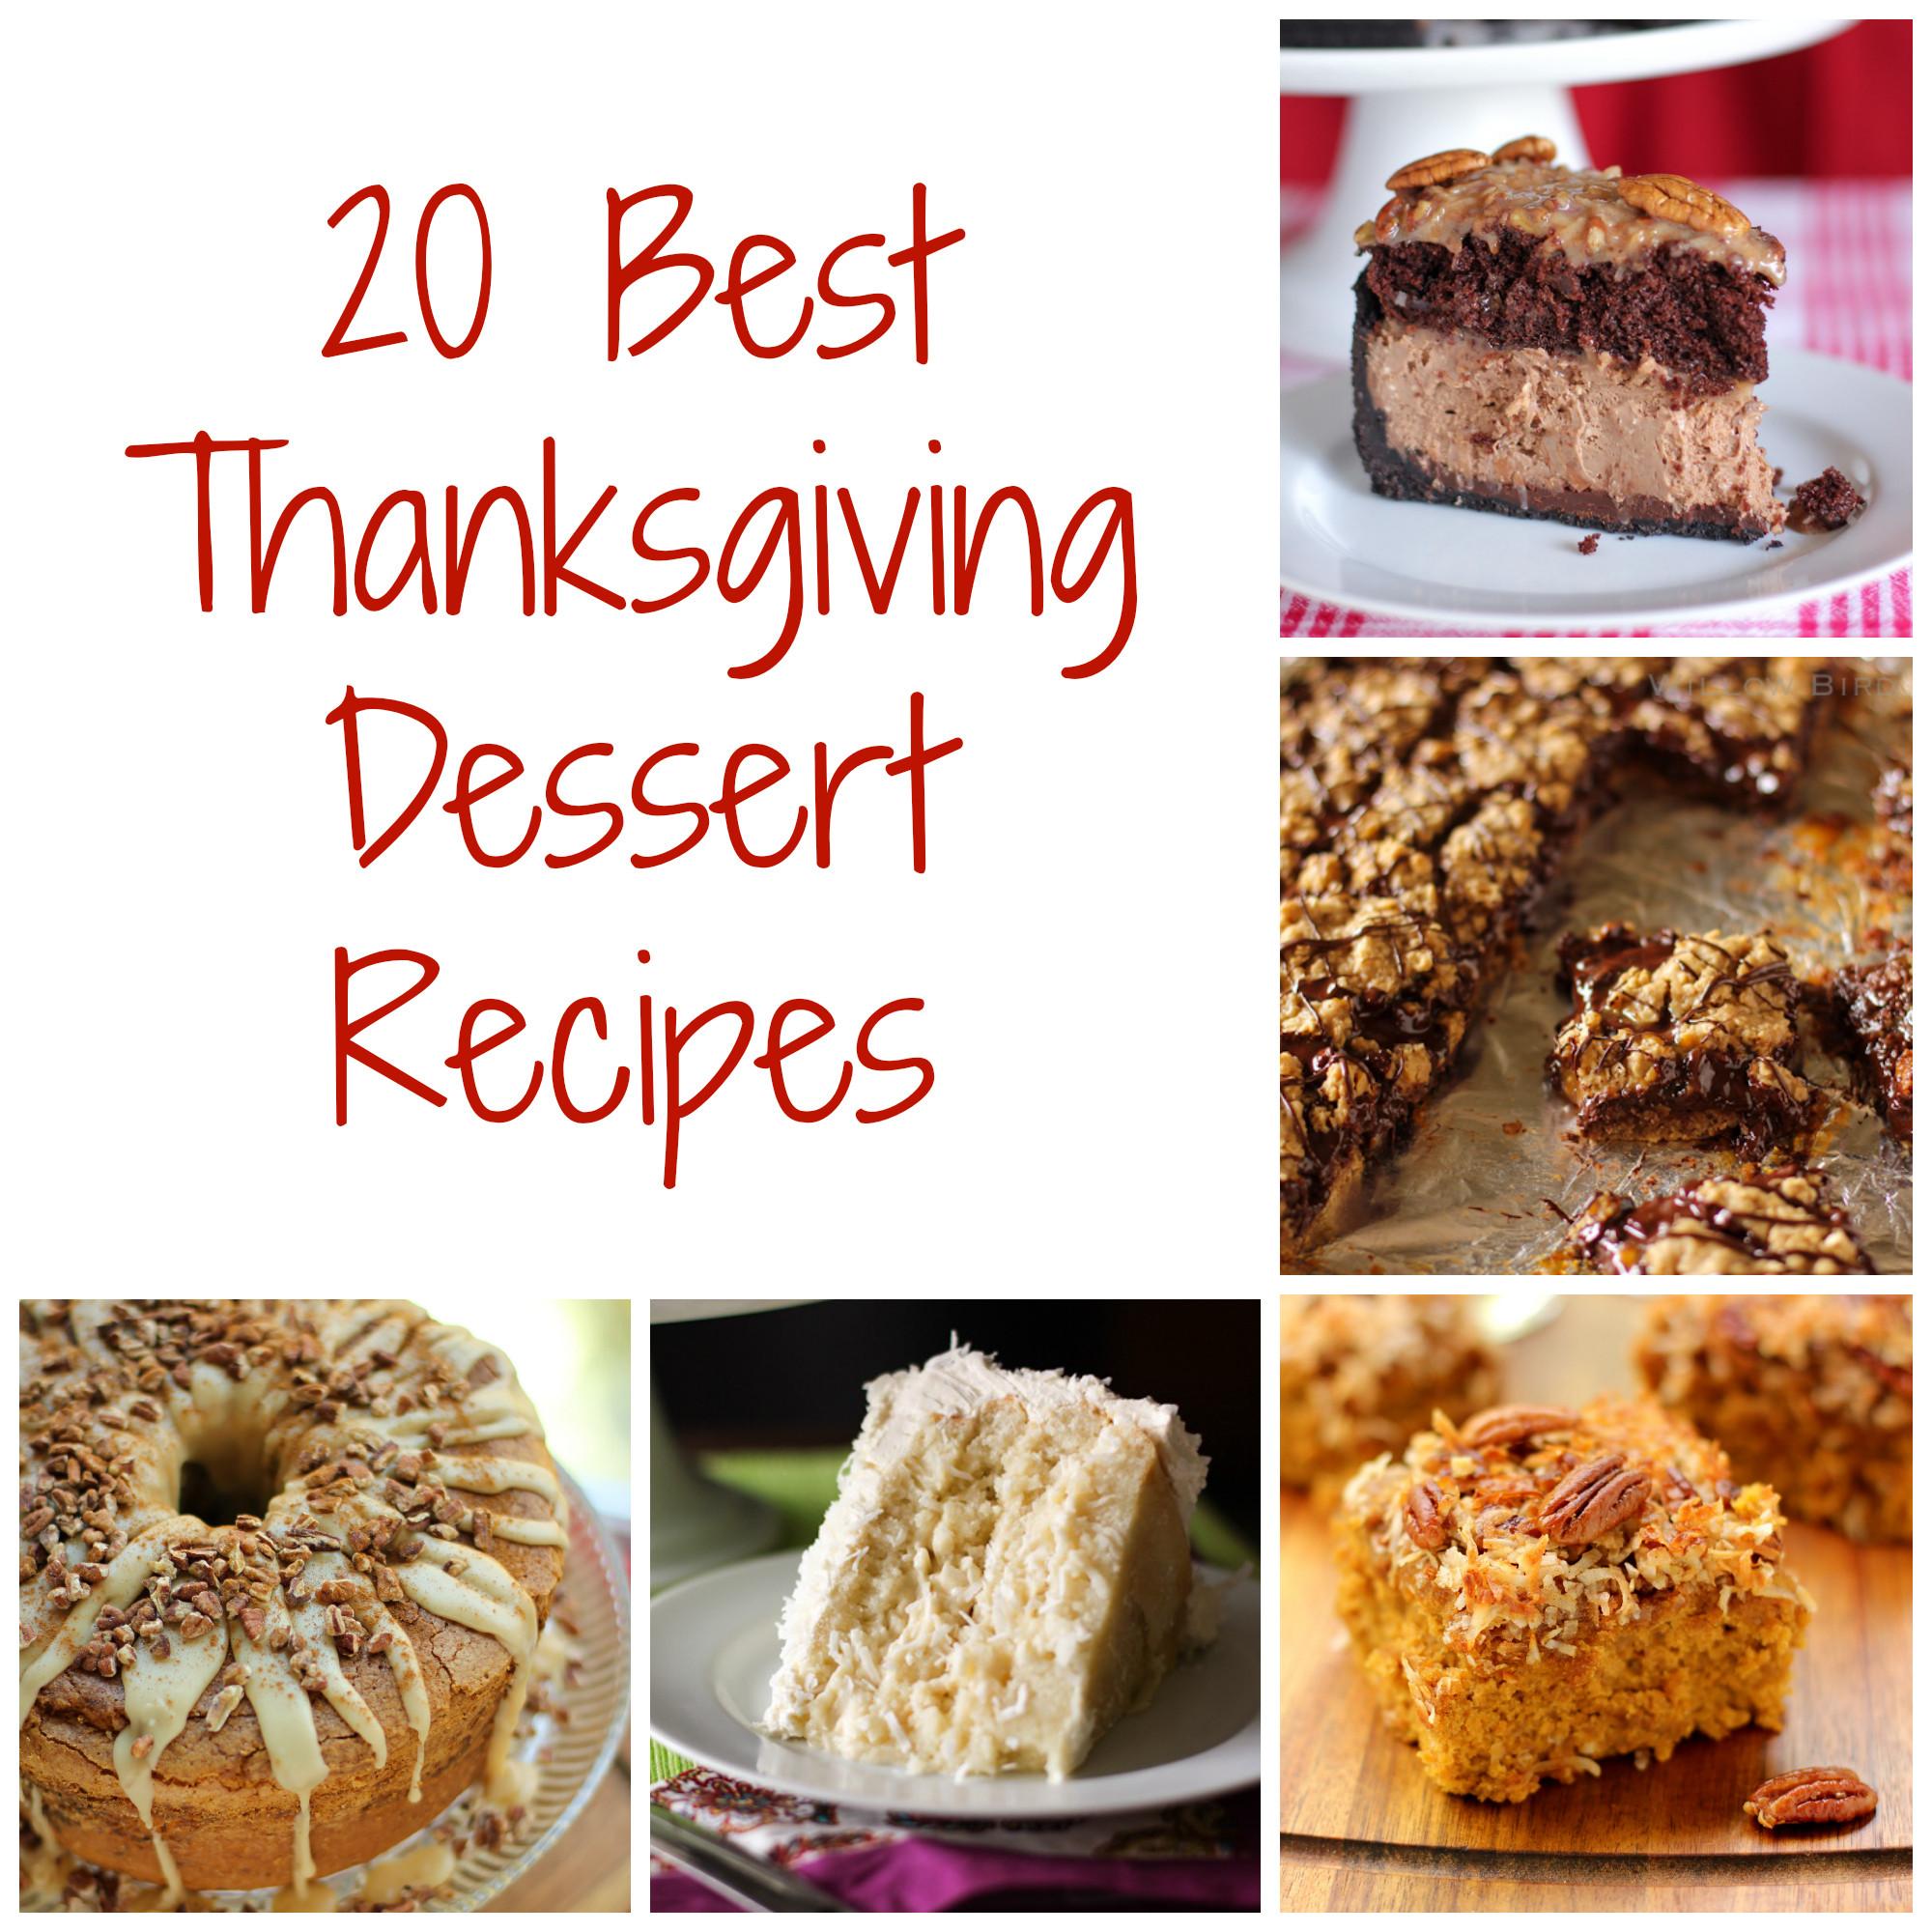 Thanksgiving Dessert Recipes  Thanksgiving Dessert Recipes Willow Bird Baking